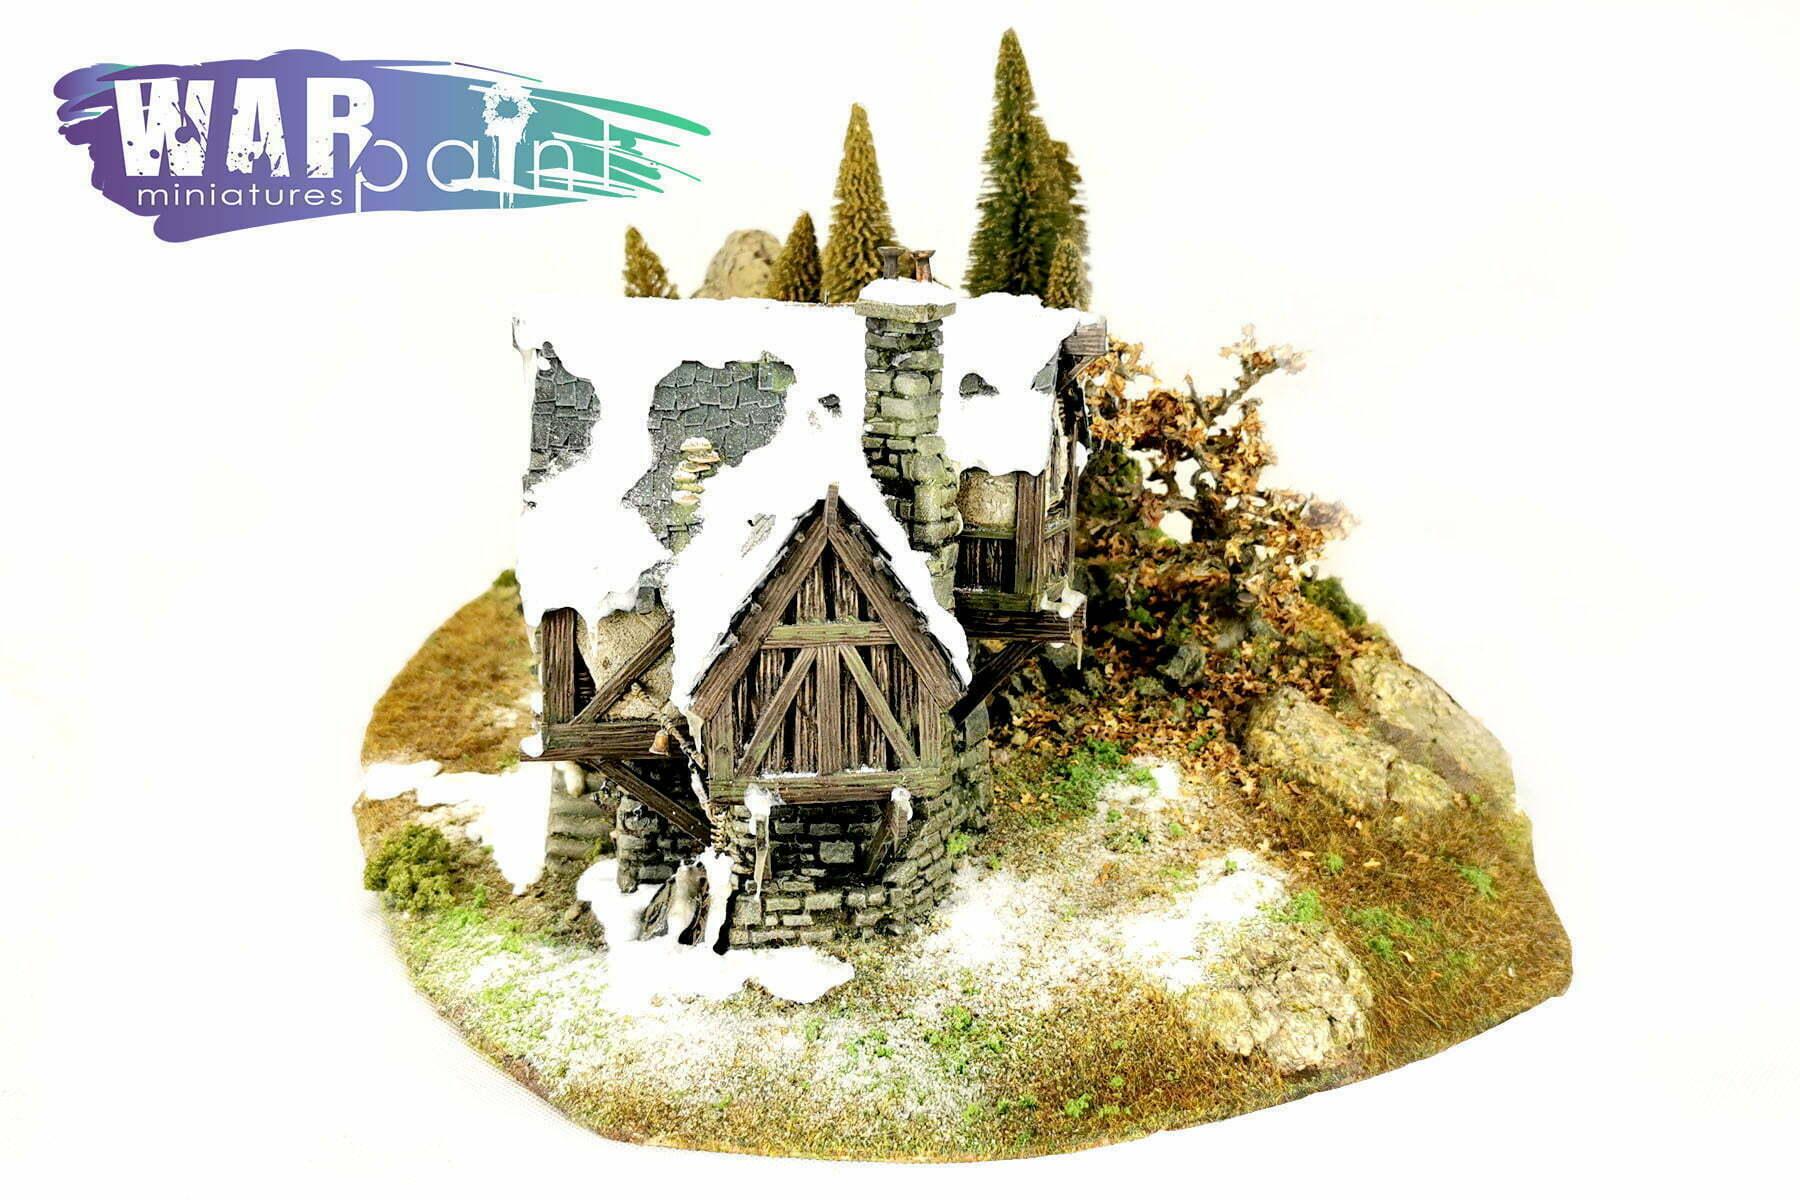 Hunting-Lodge-Scenery-web-optimised-2